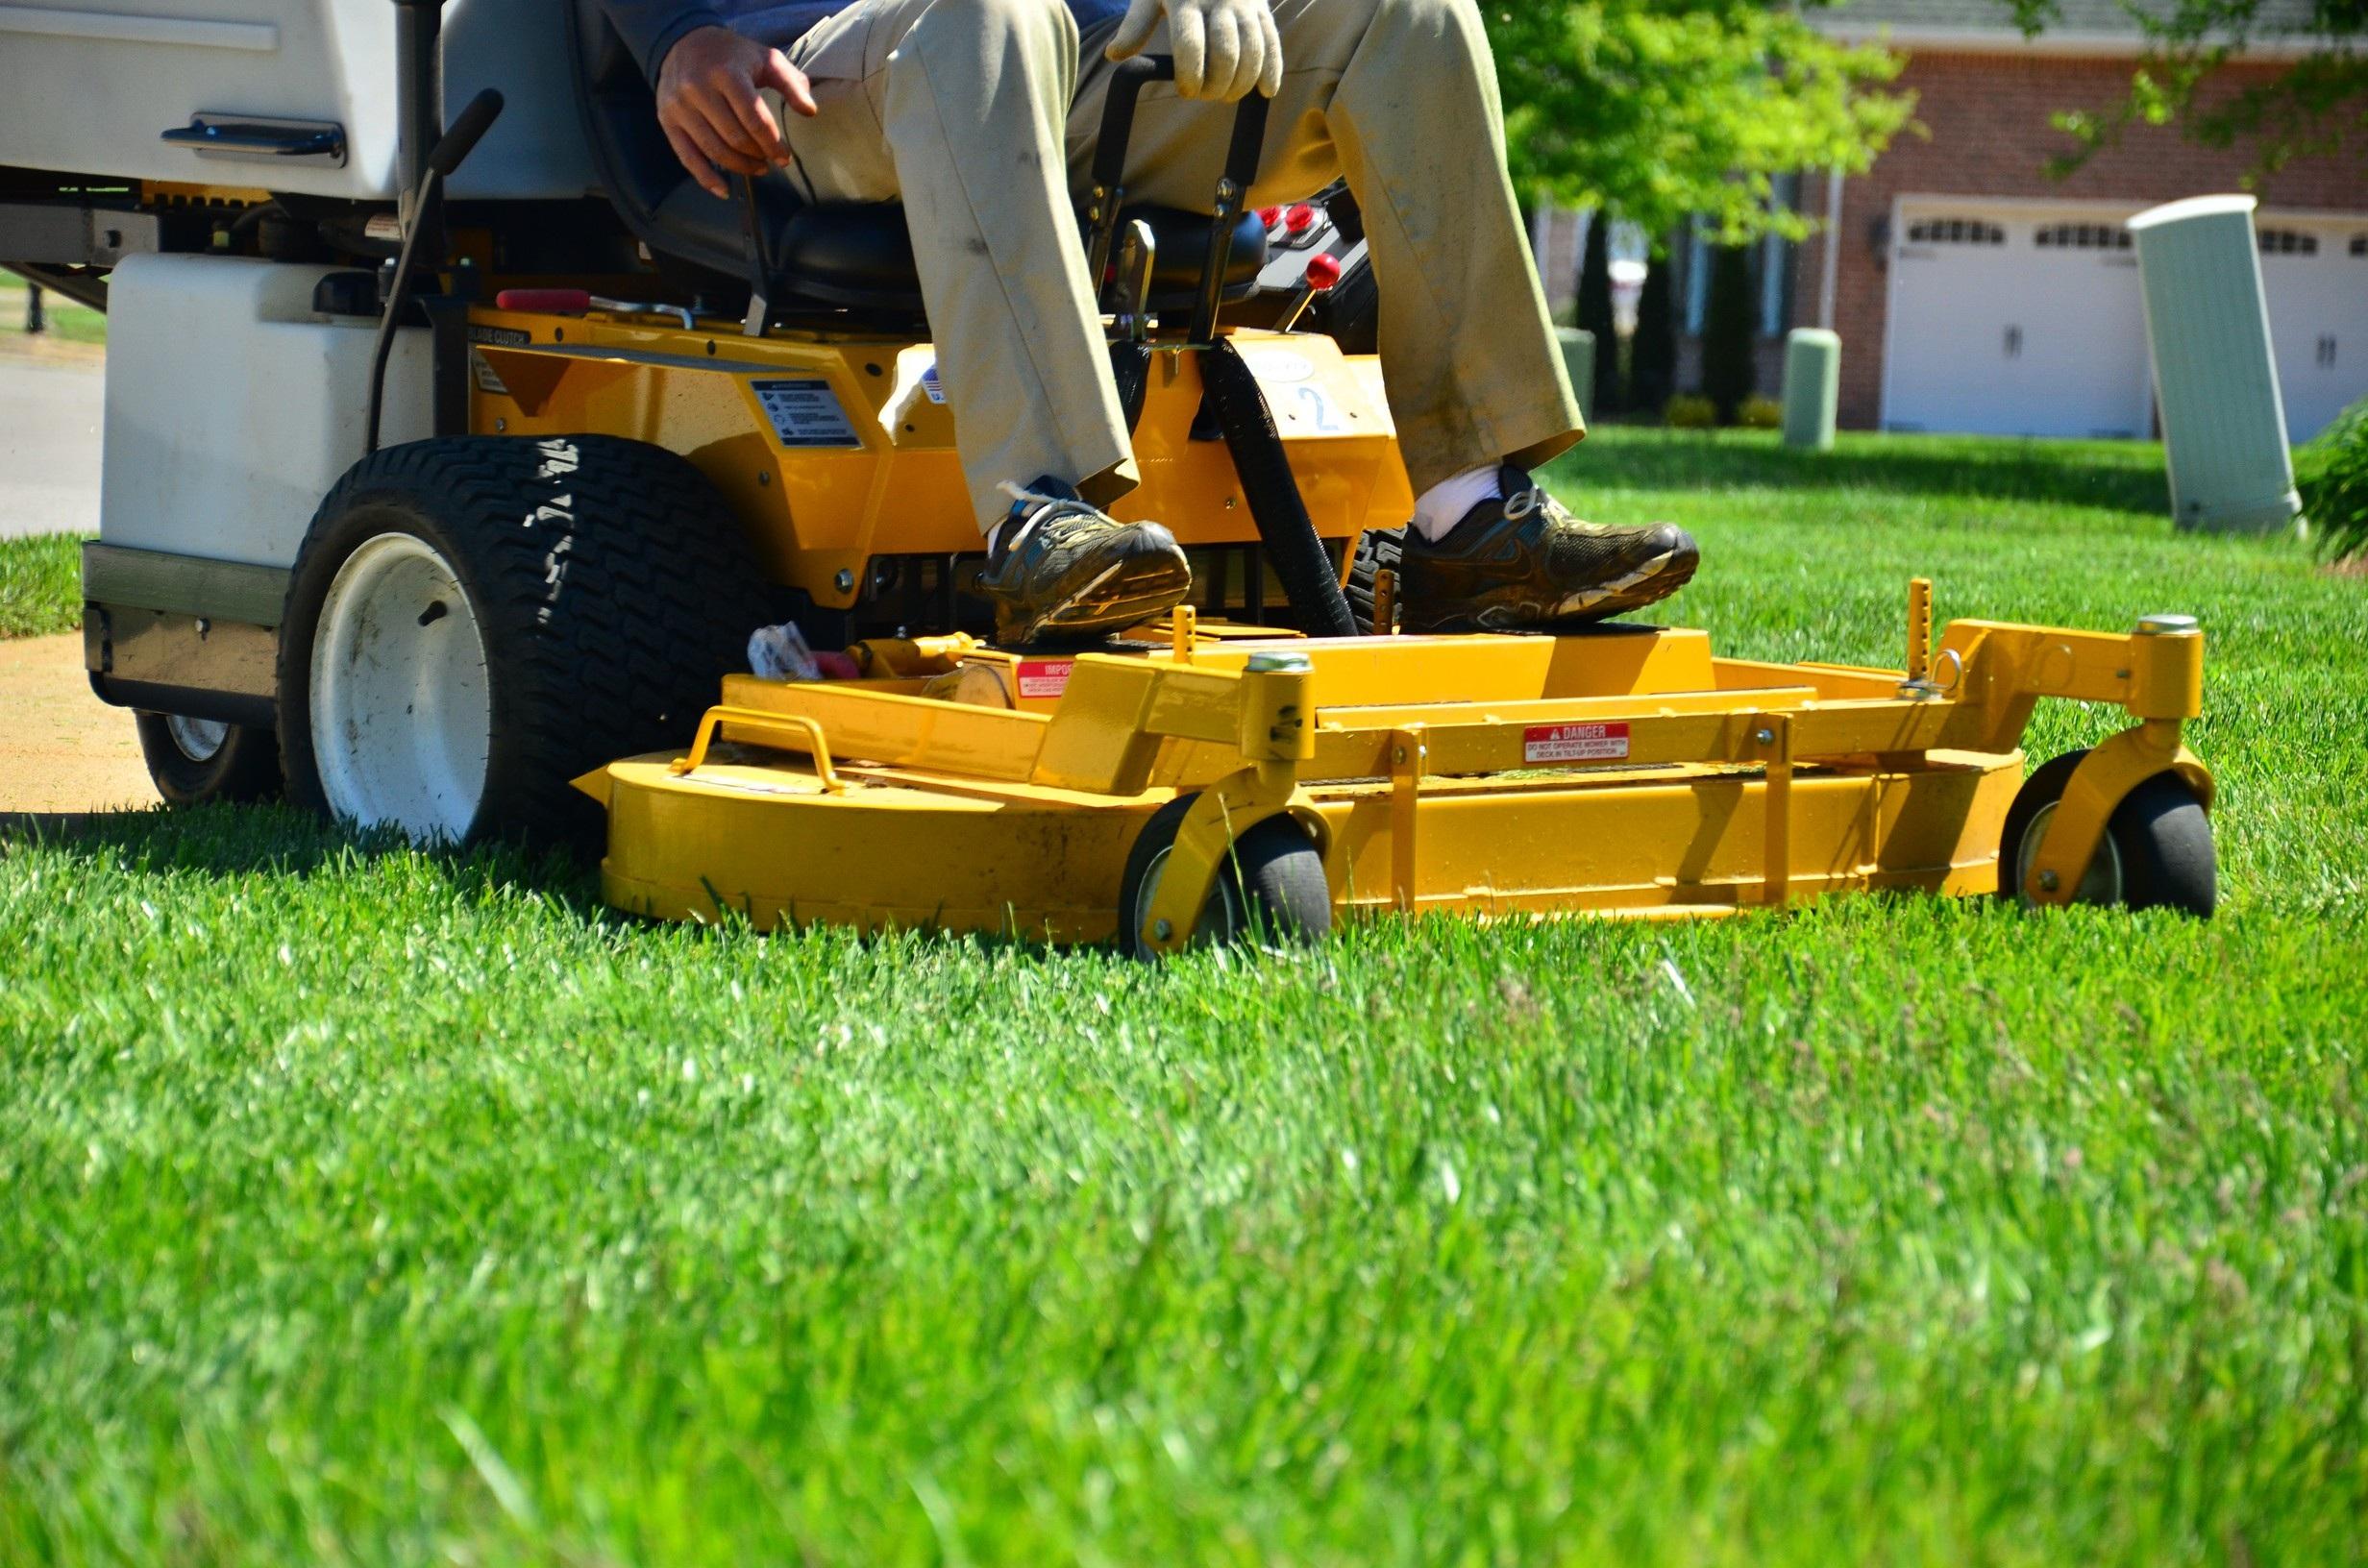 Free images field tool asphalt vehicle lawn mower for Garden maintenance van